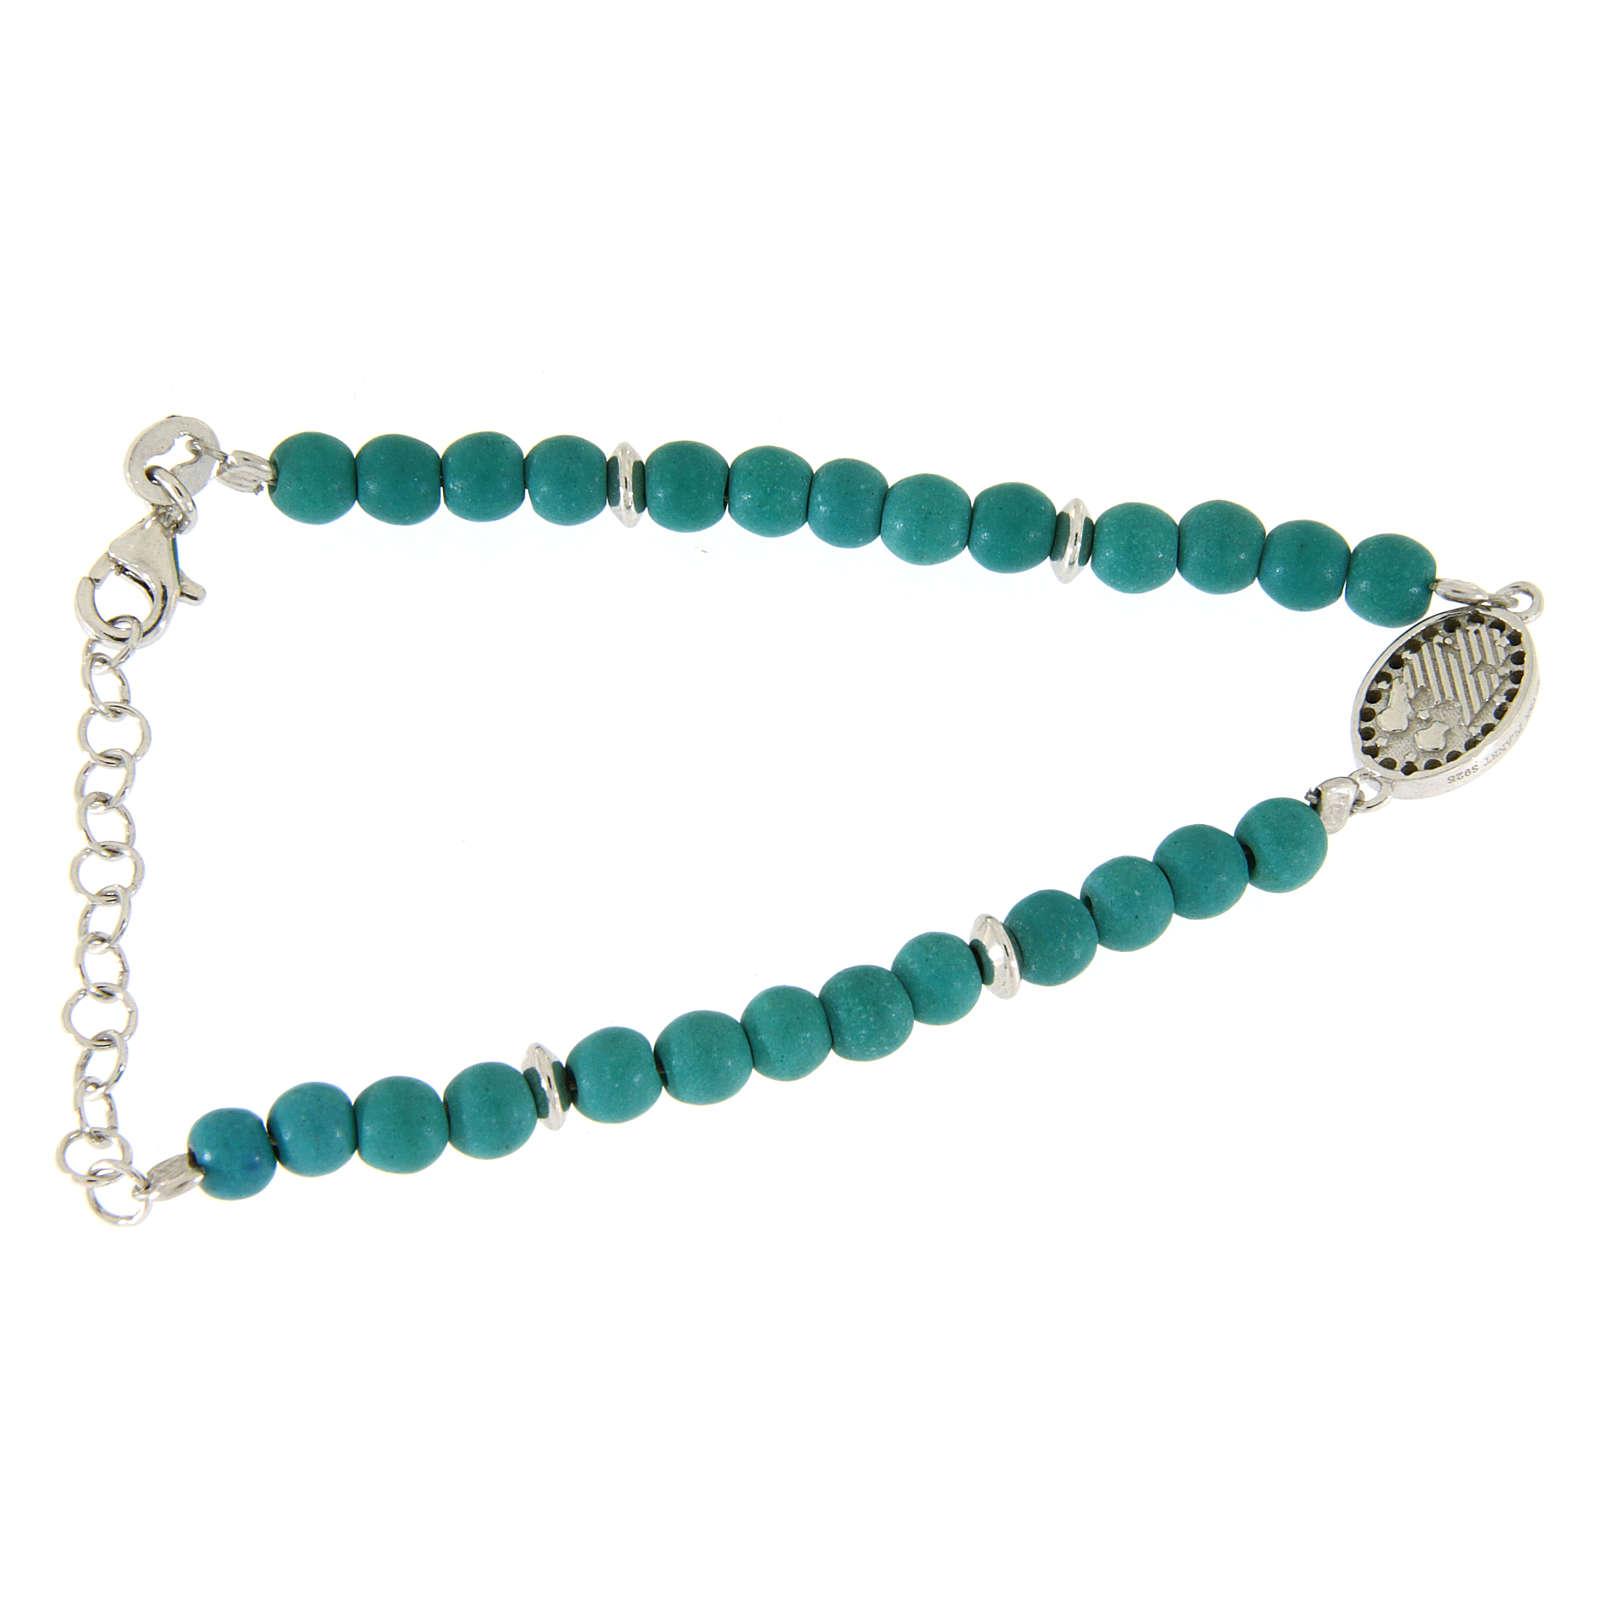 Bracciale perline pasta turchese medaglietta S. Rita zirconi neri - argento 925 4